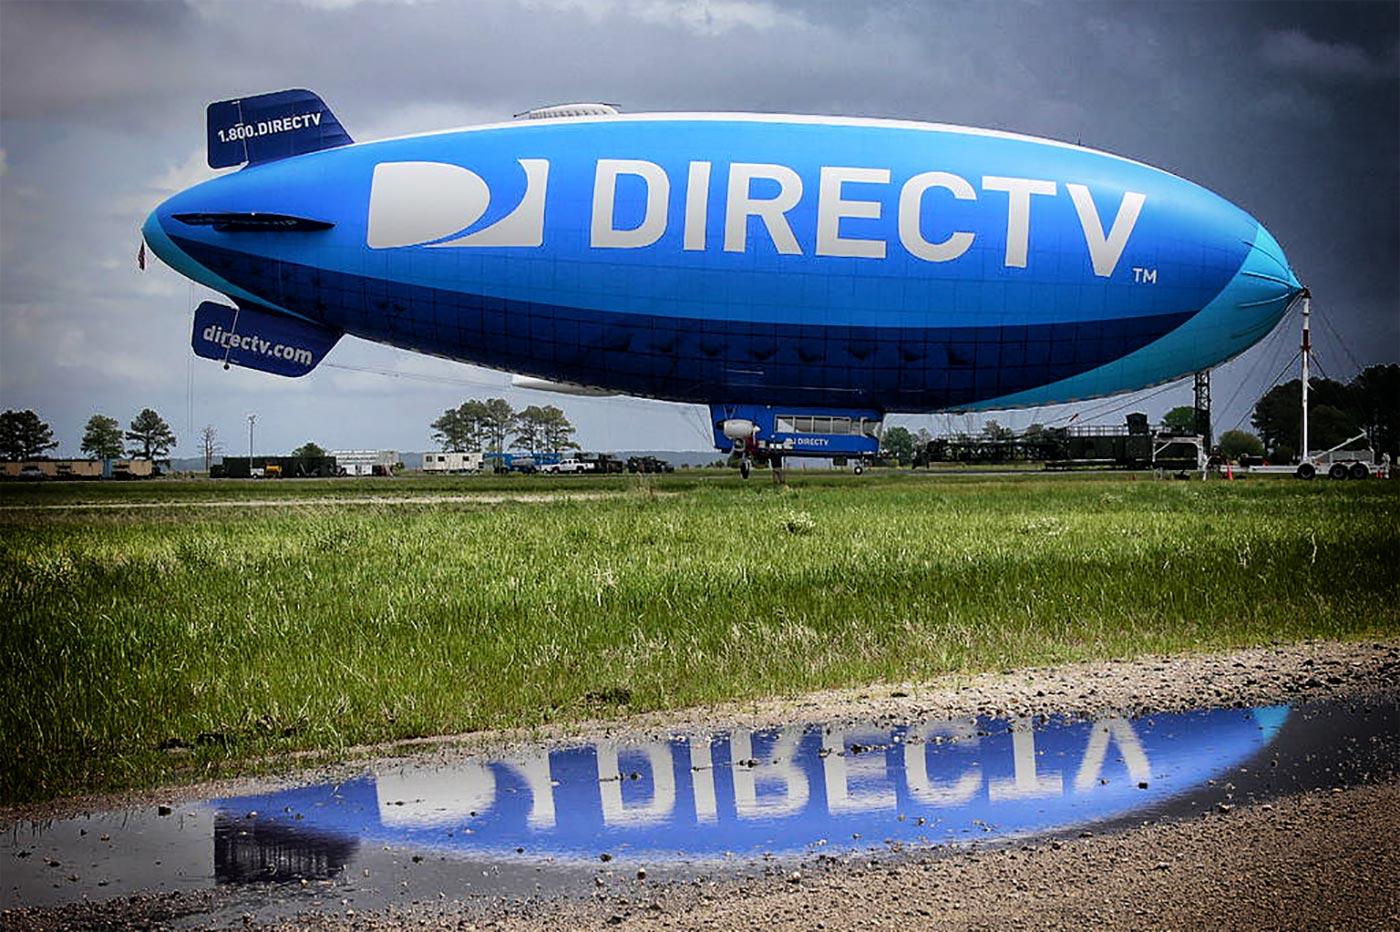 1024px-directv_airship_in_north_carolina